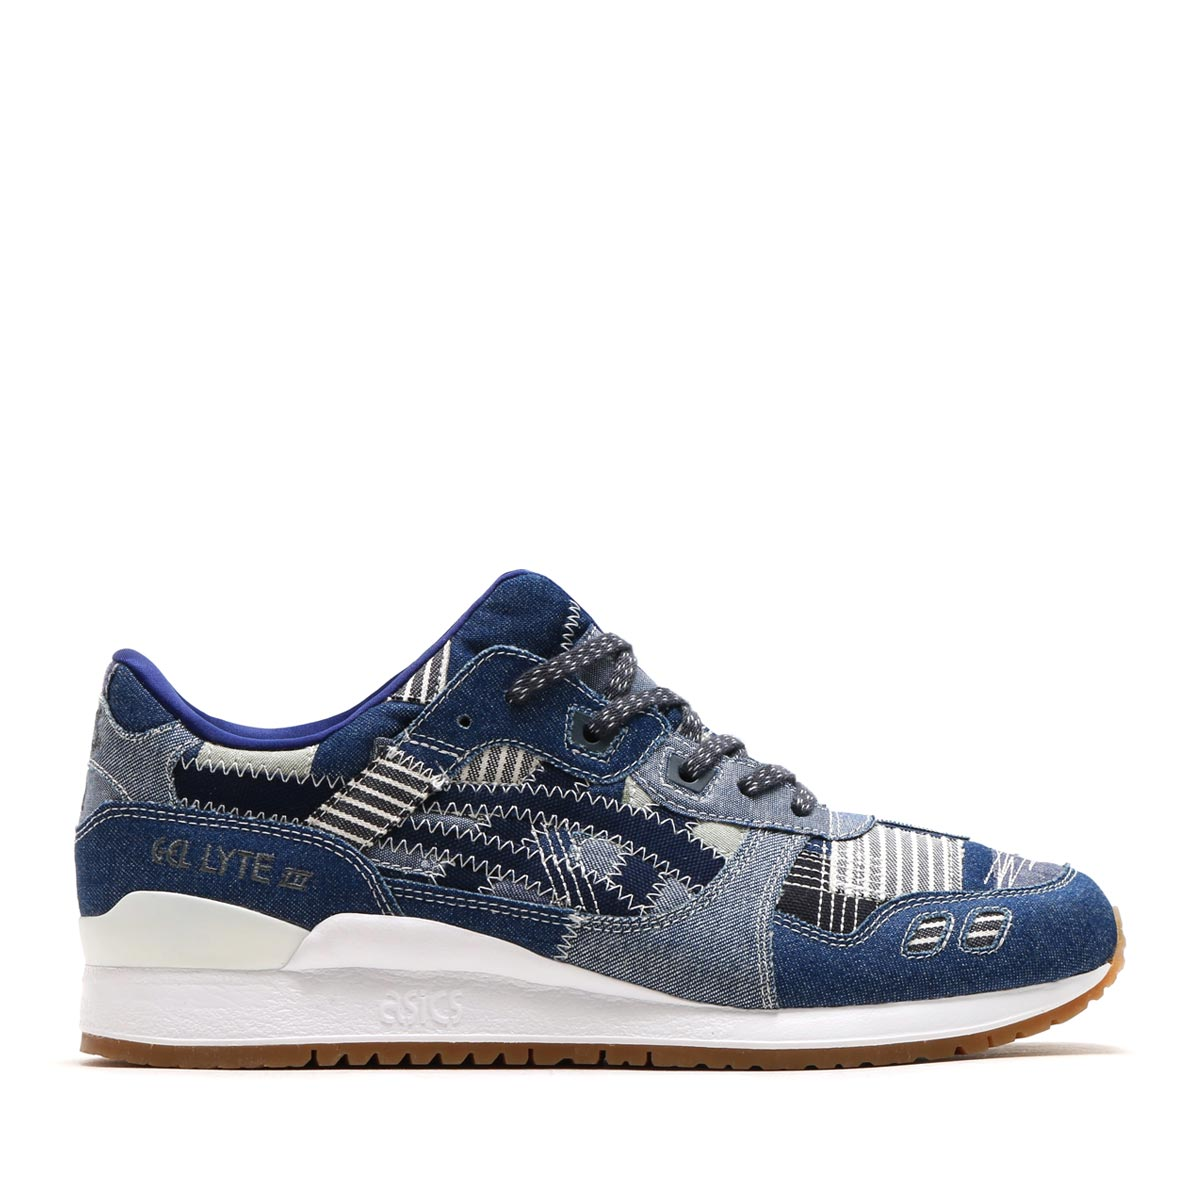 asics tiger gel-lyte ii ranru pack indigo blue 4